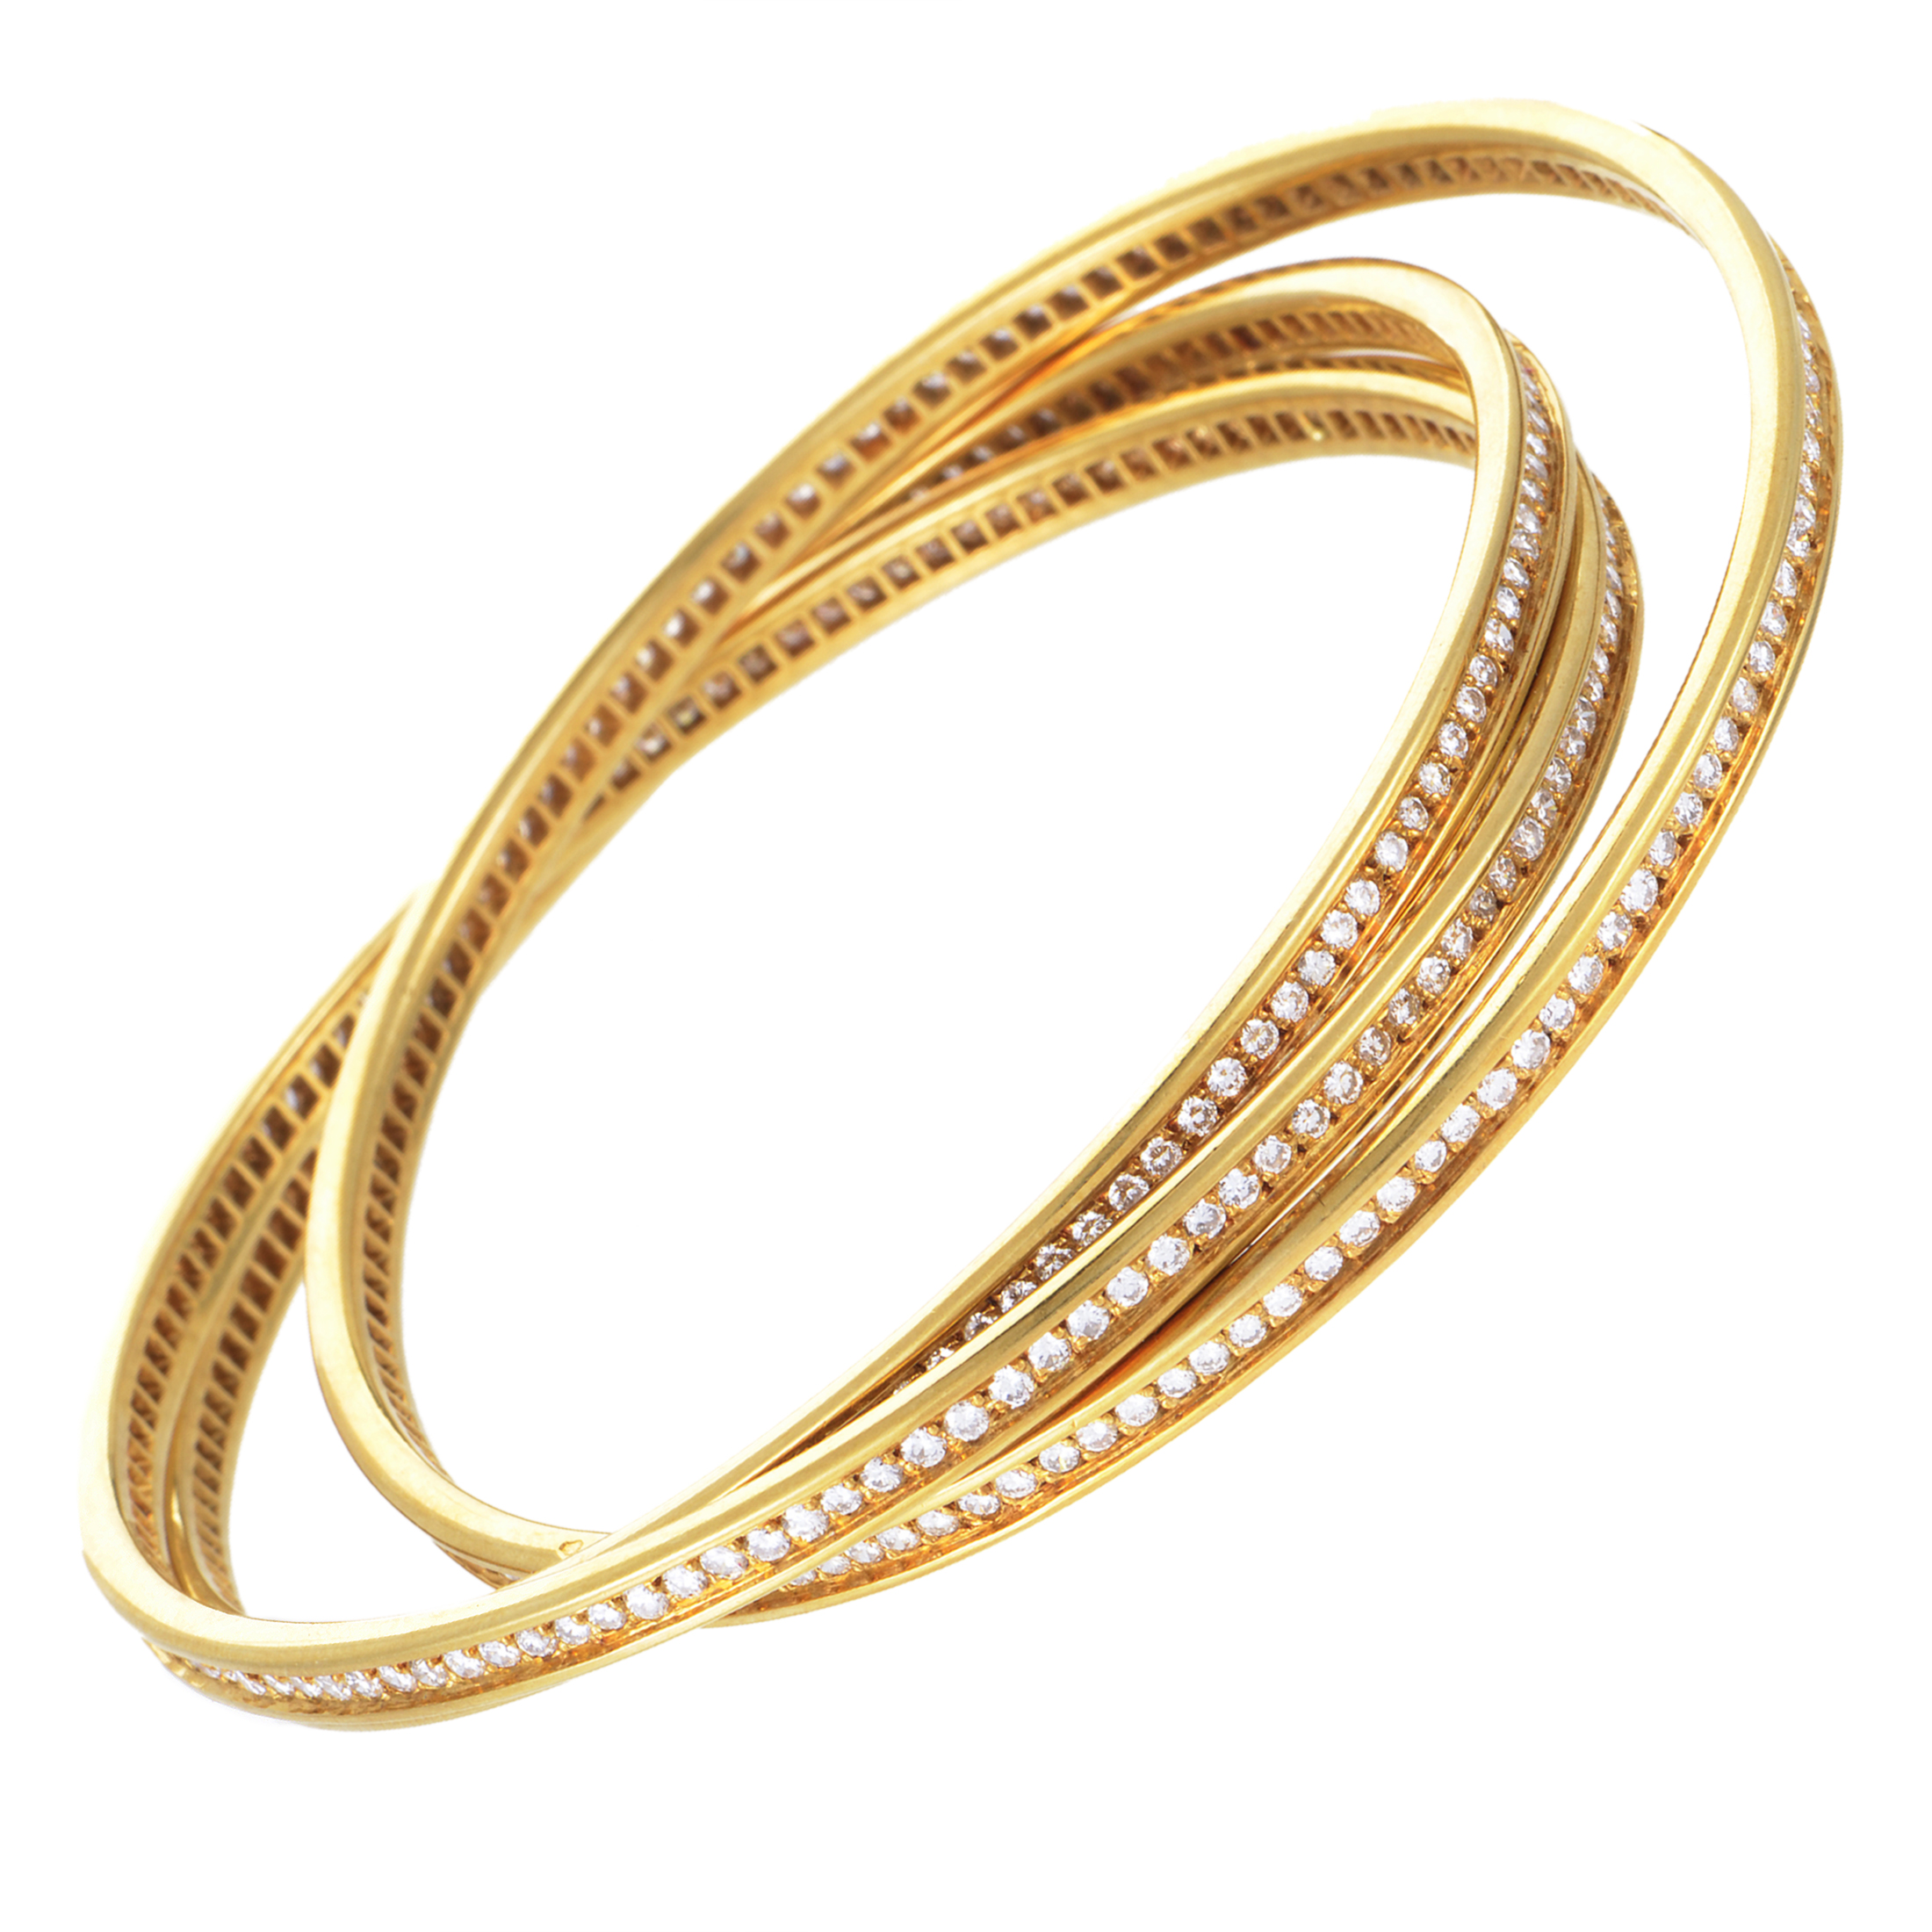 Cartier Womens 18k Yellow Gold Diamond Pave Rolling Bangle